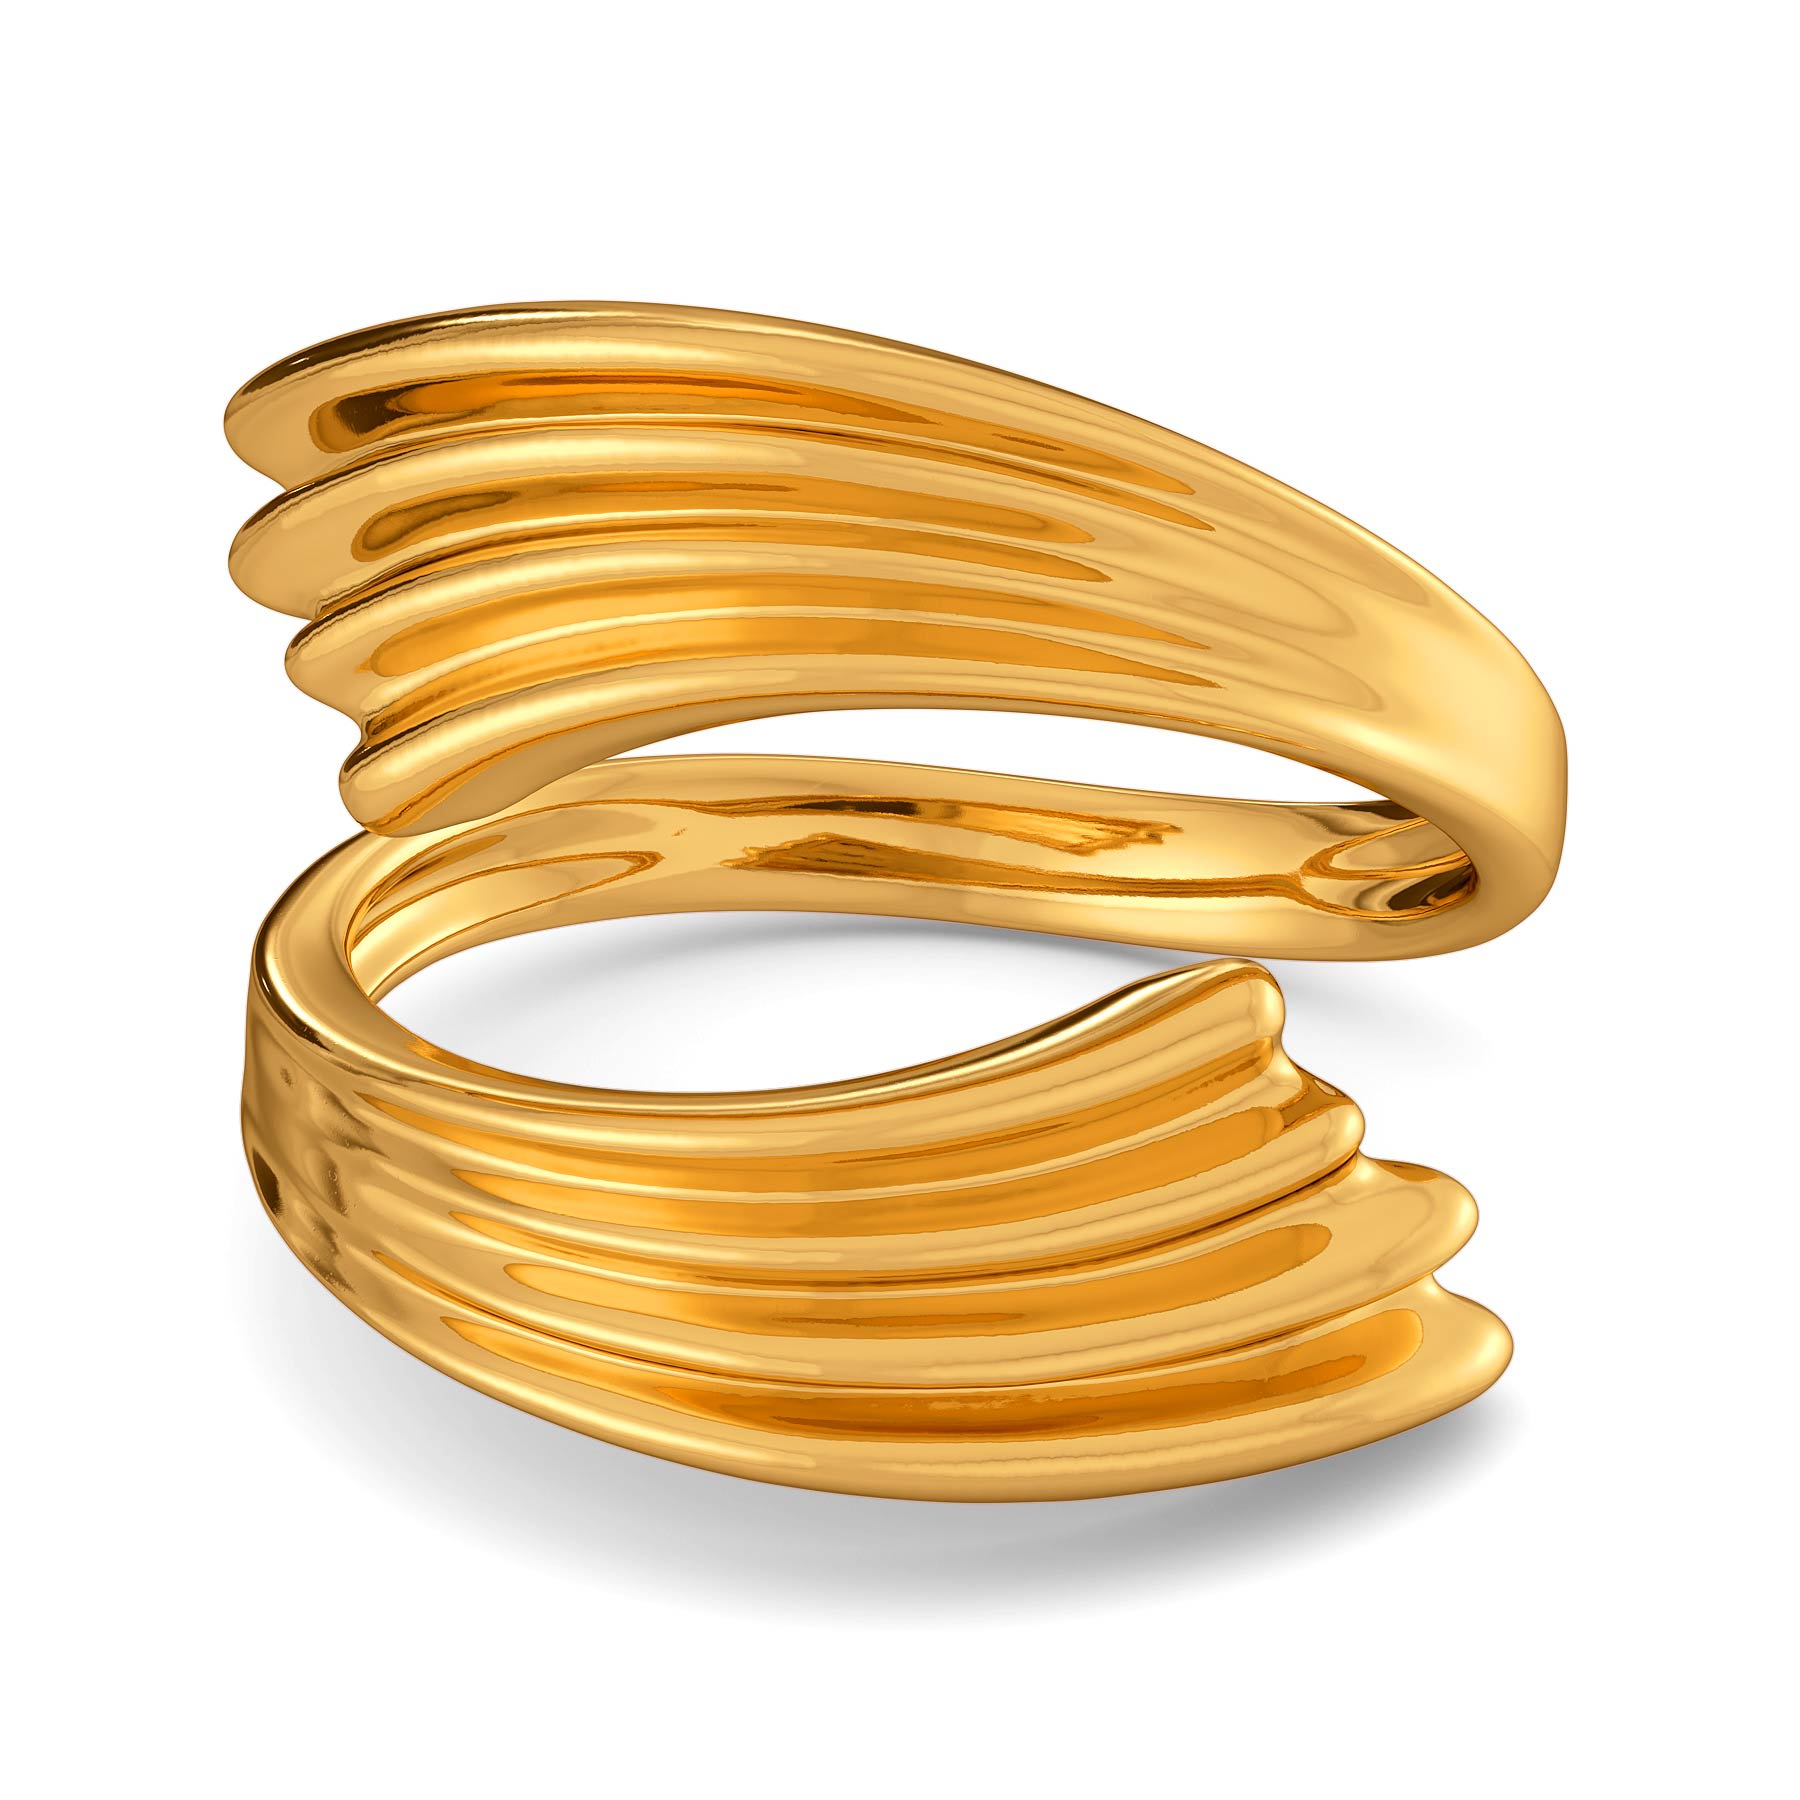 Graceful Folds Gold Rings